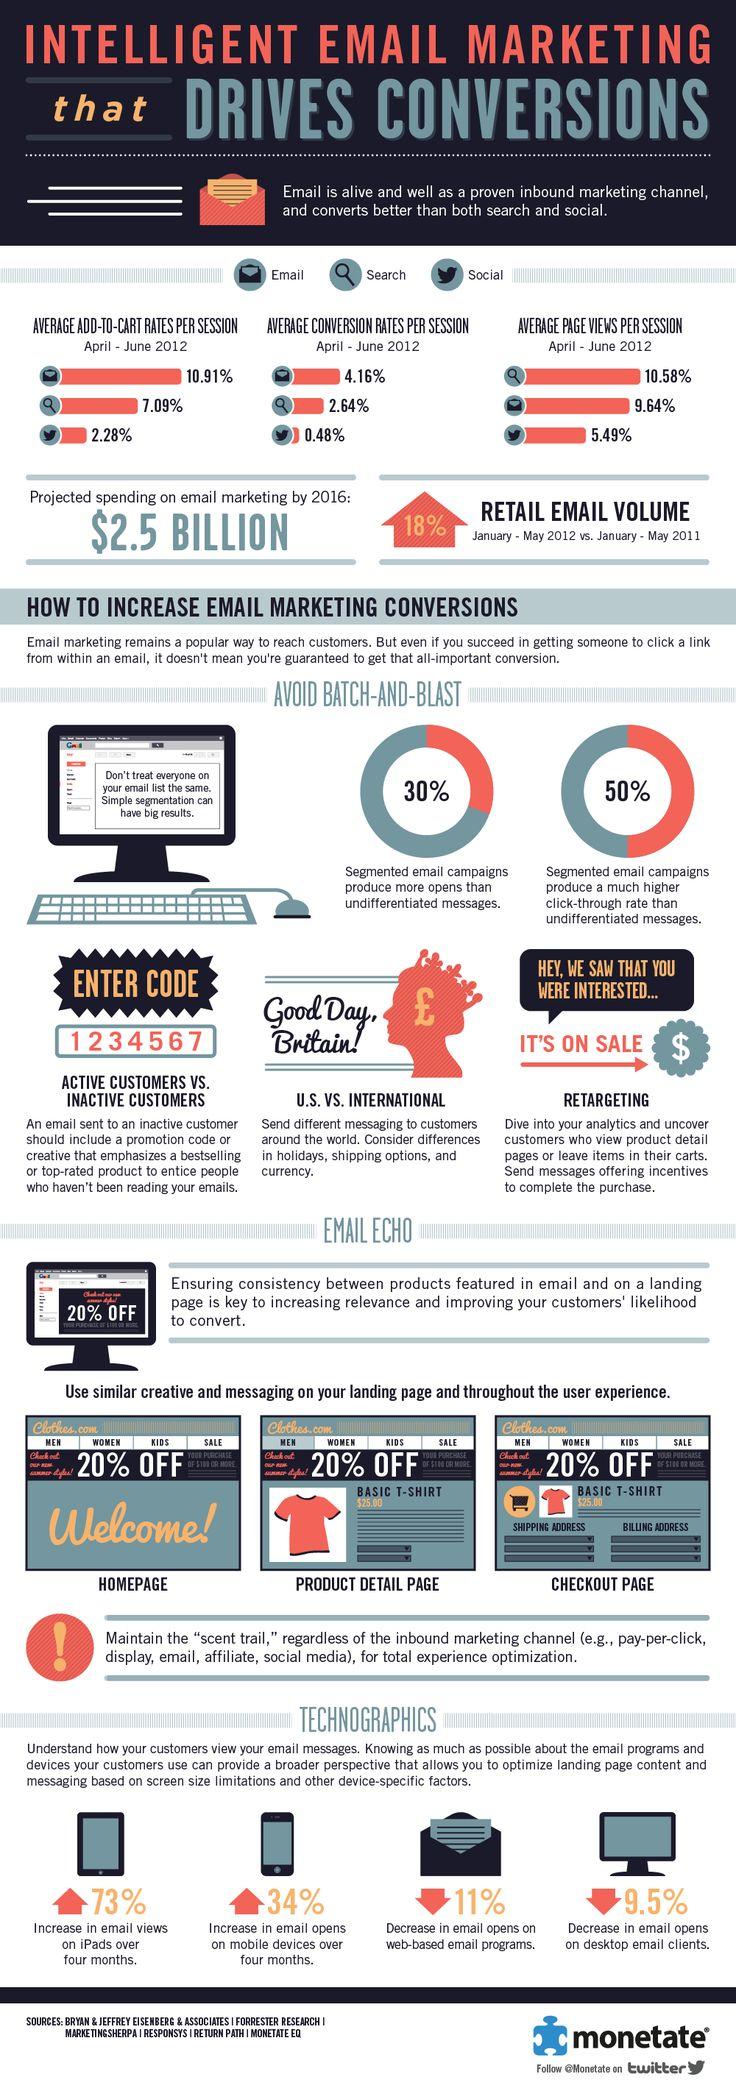 email-marketing-infographic.jpg